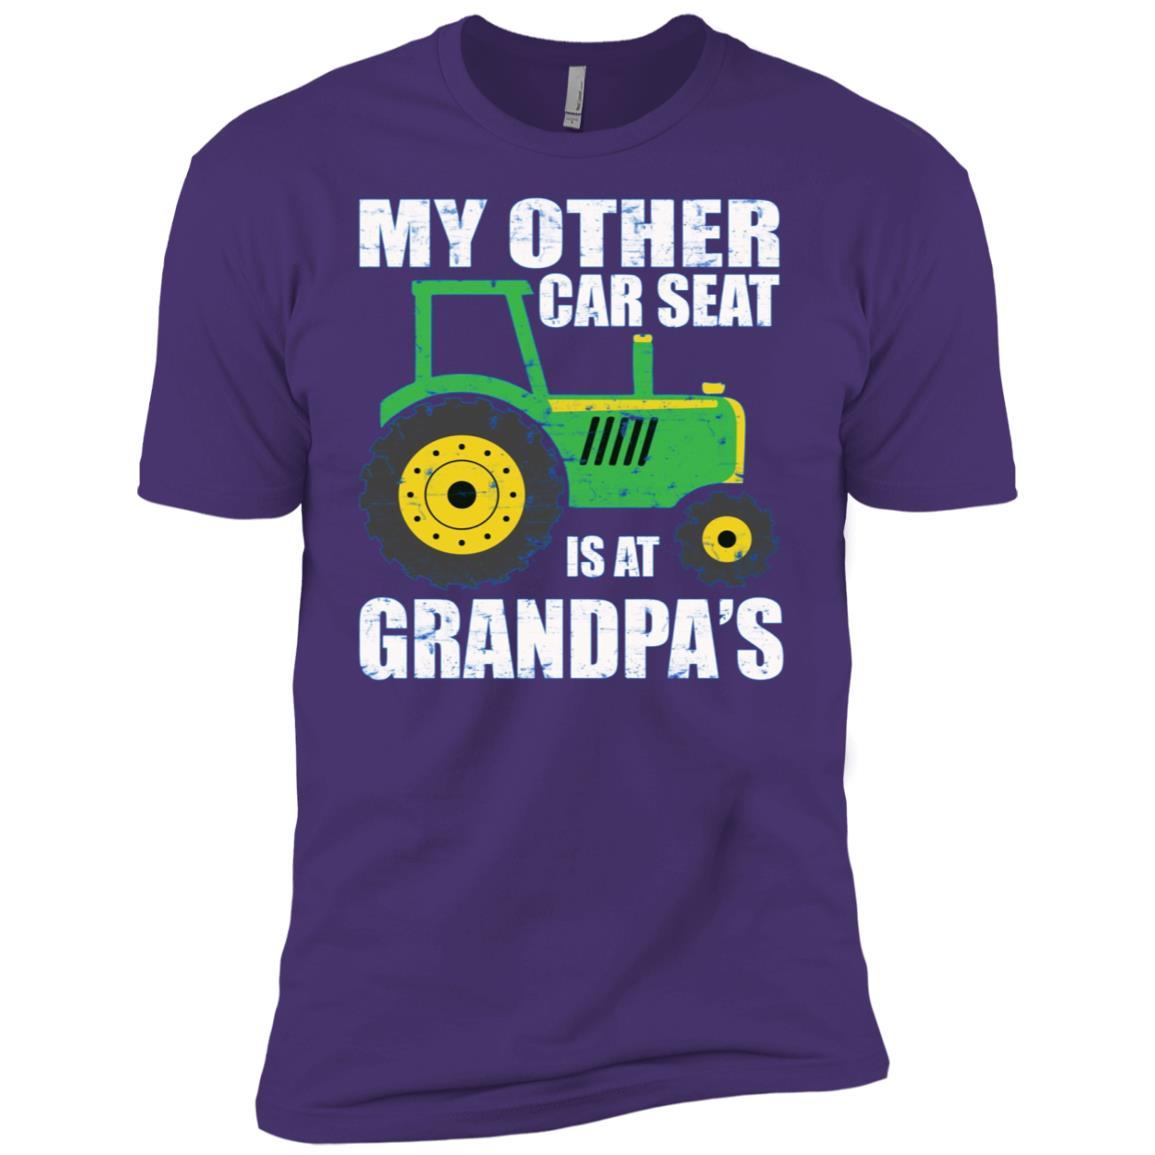 Kids Toddler Tractor Toddler Farmer Clothes for Boys Men Short Sleeve T-Shirt